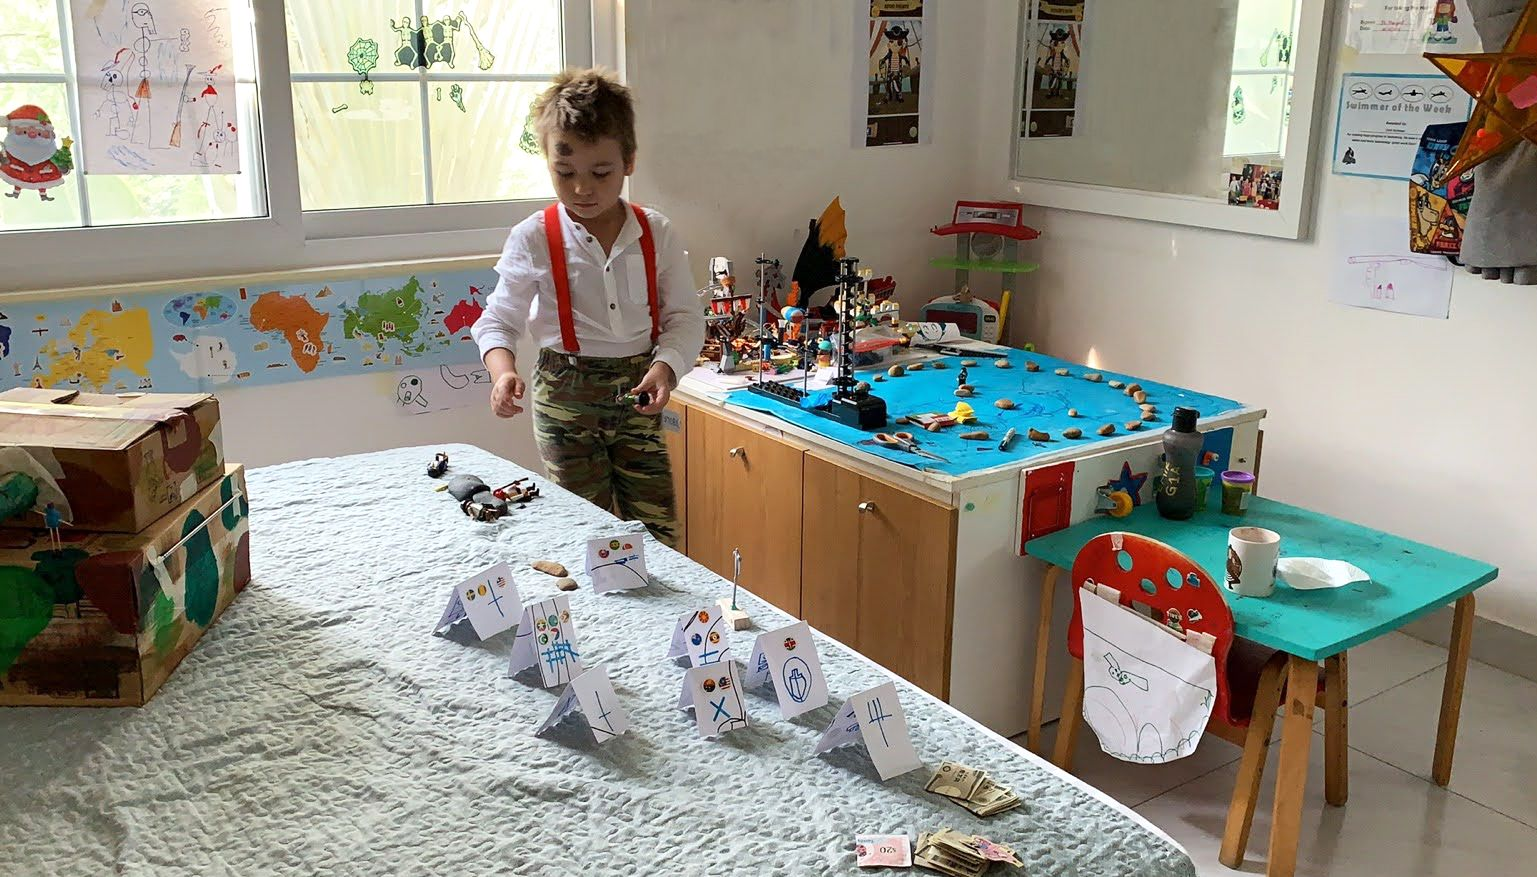 parenting 2020 homemade toys Emir Karimov playroom homeschooling toys DIY